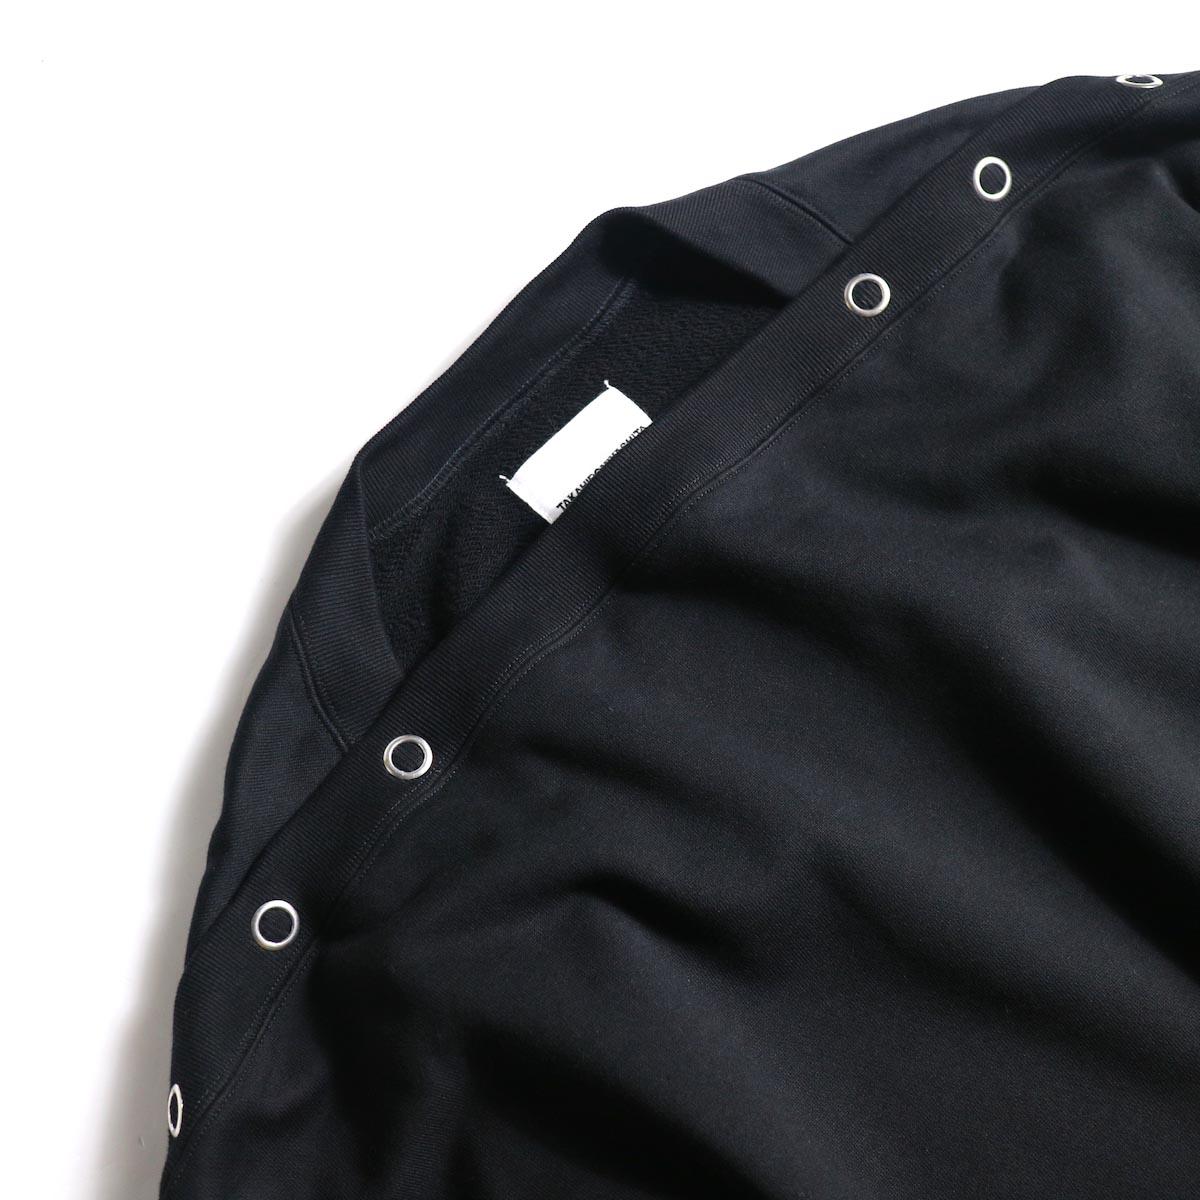 The Soloist / sc.0001bAW20 shoulder buttoned boat neck sweatshirt. (Black)ボートネック